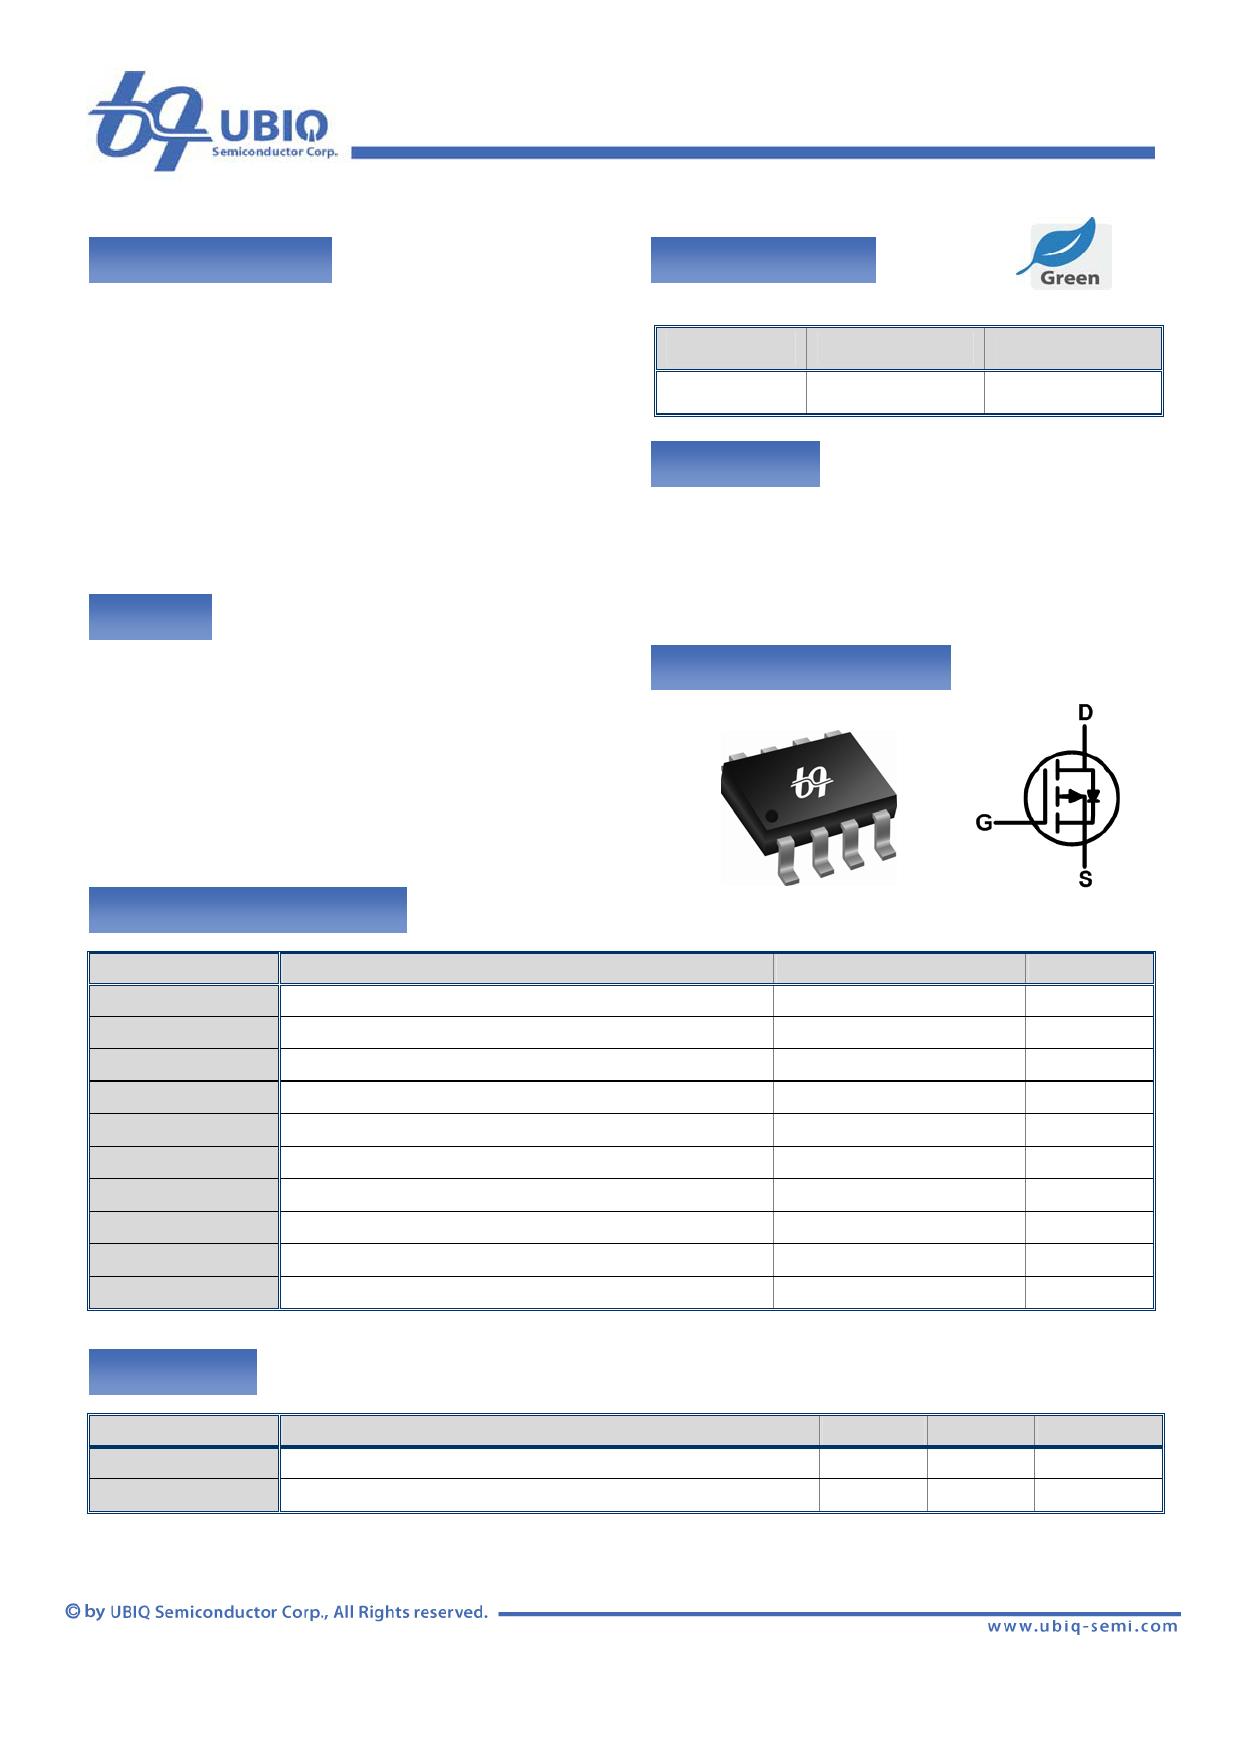 QM4001S 데이터시트 및 QM4001S PDF